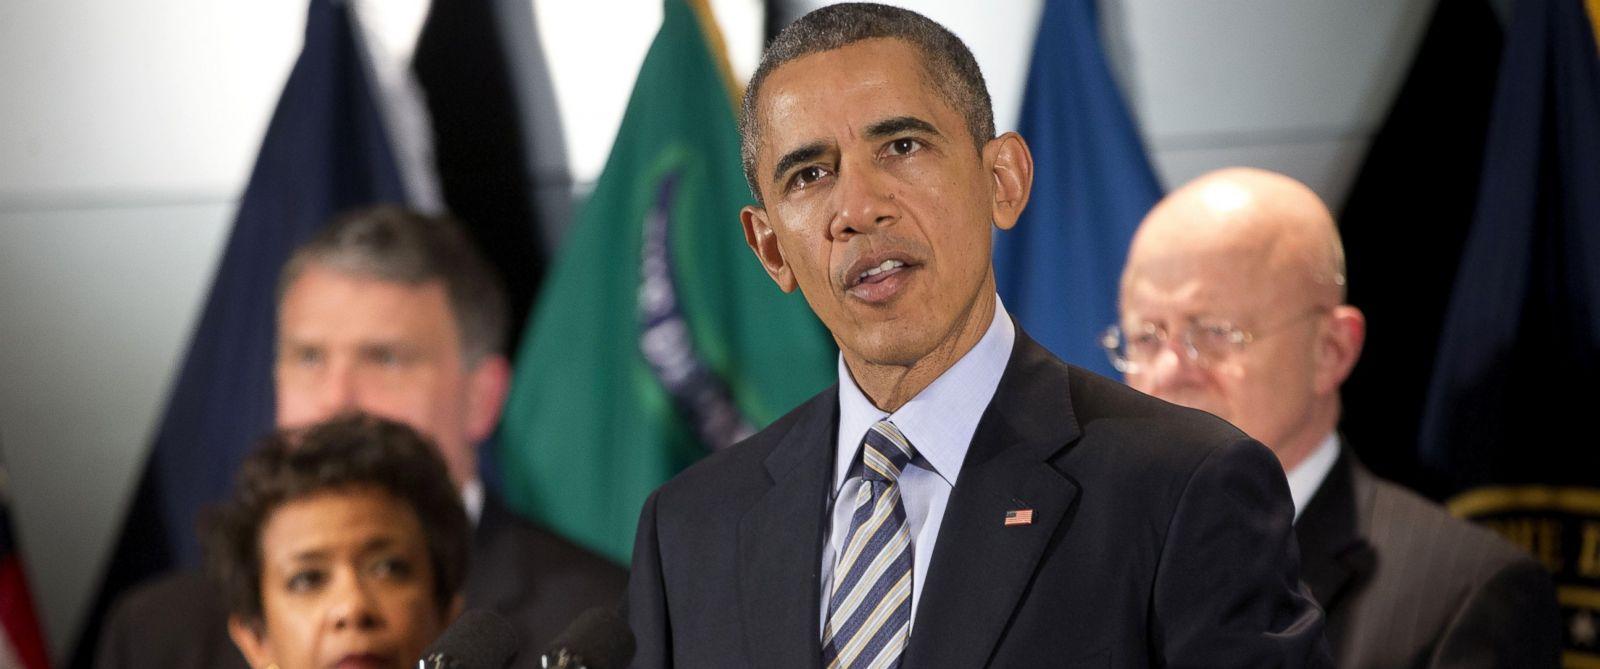 PHOTO: President Barack Obama speak at the National Counterterrorism Center in McLean, Va., Dec. 17, 2015.